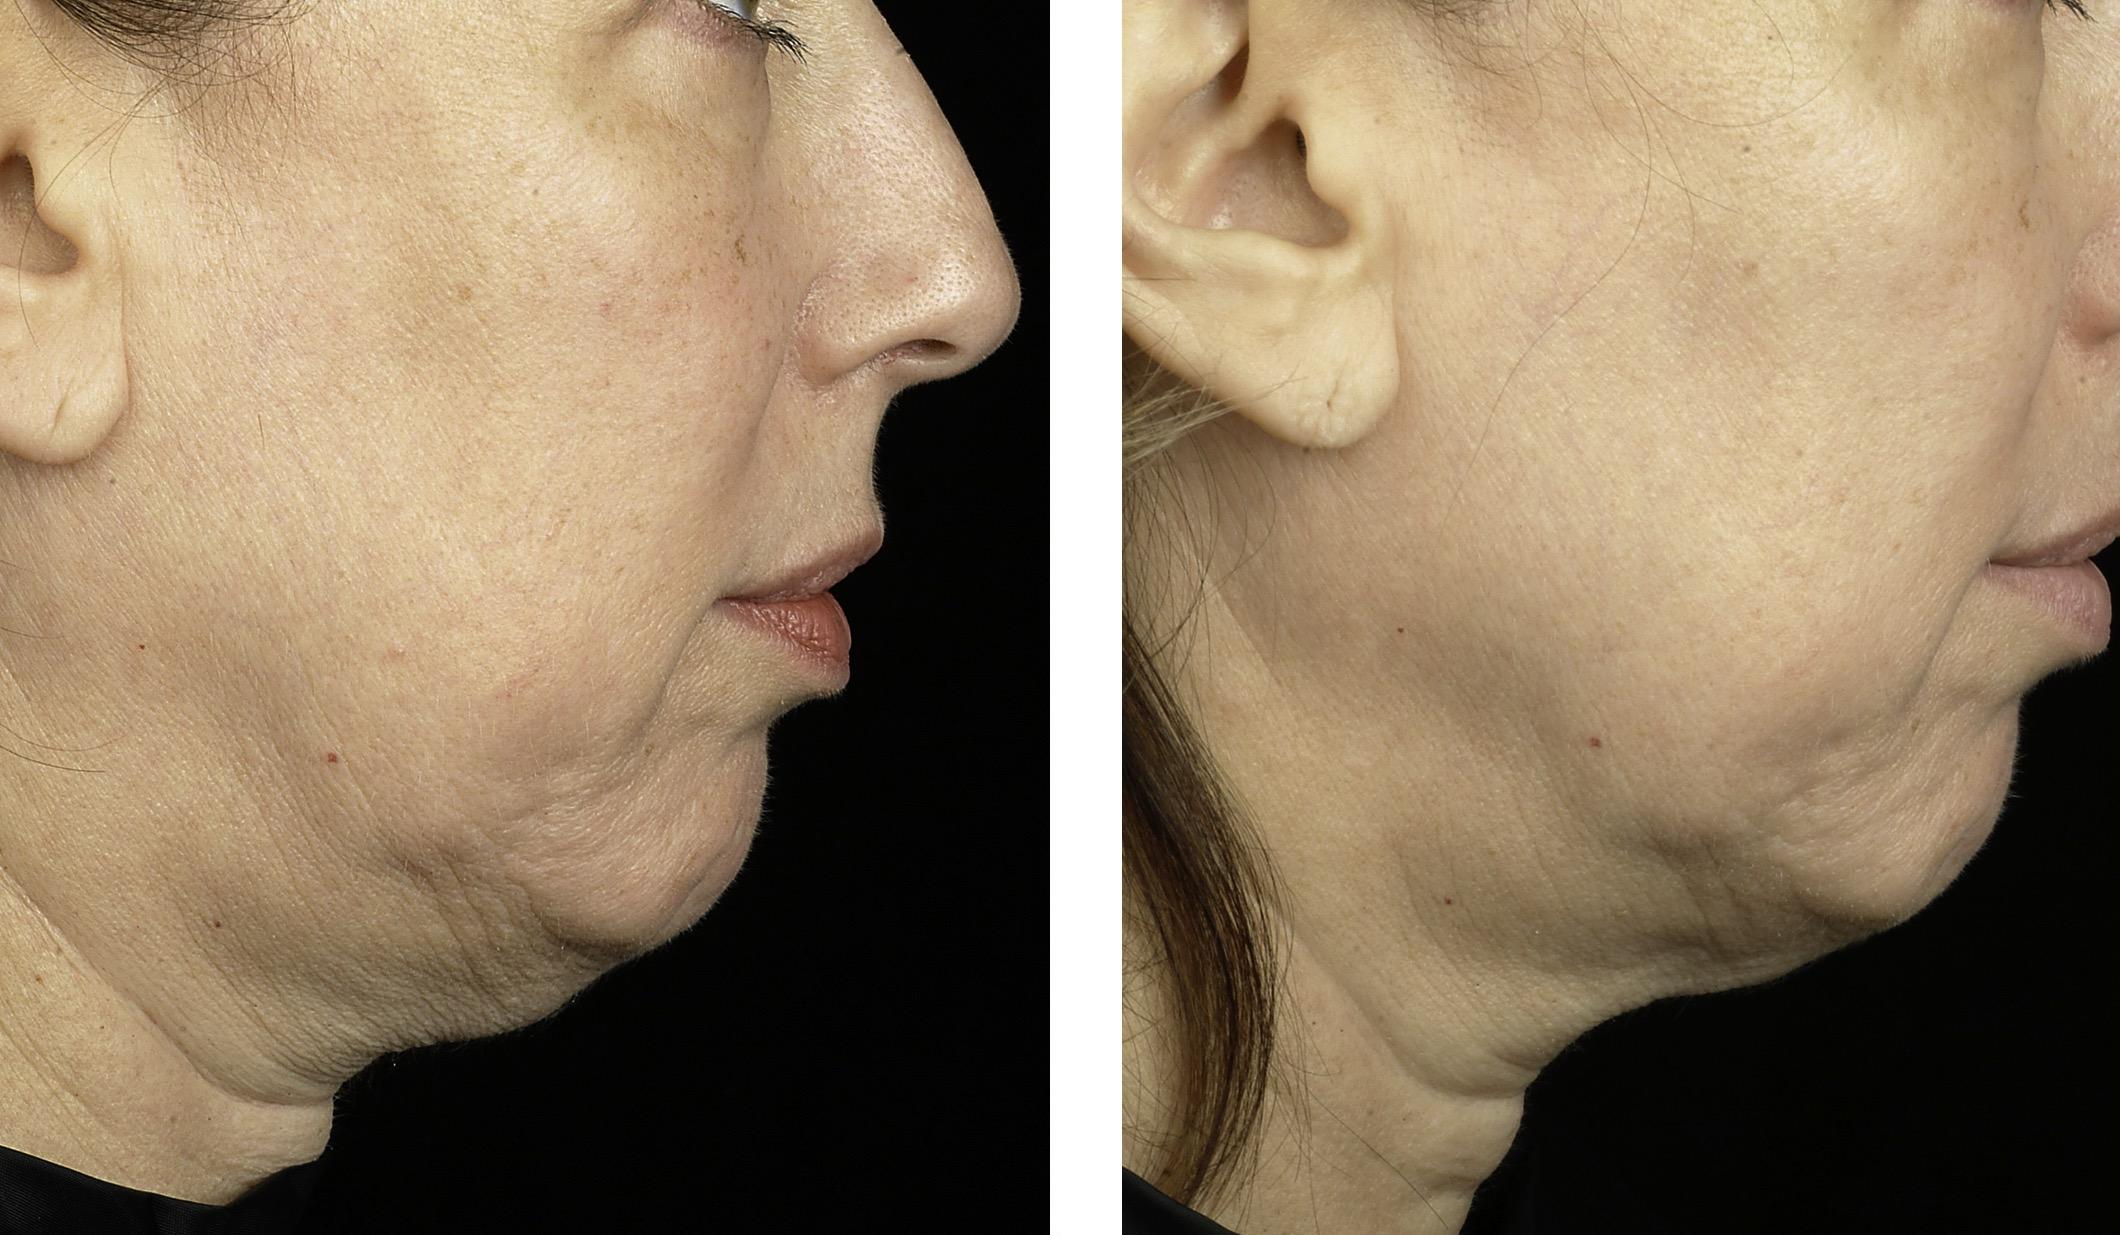 weight loss surgery autoimmune disease